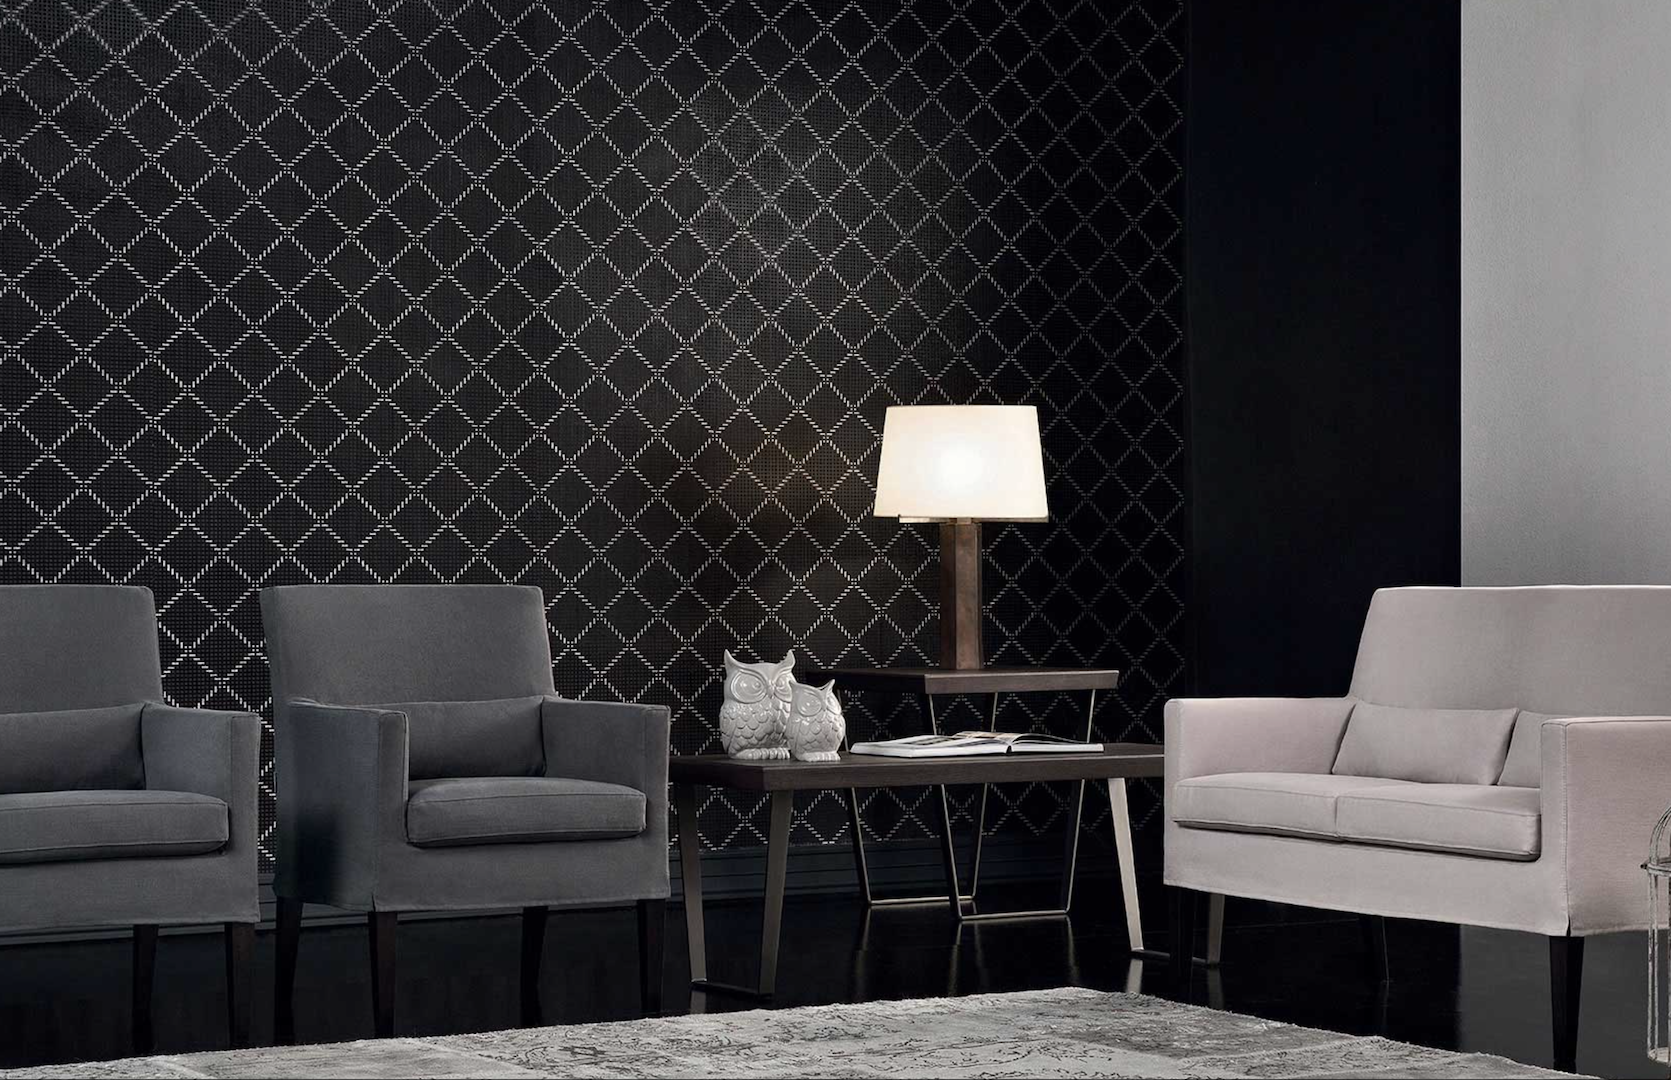 AMC 125 Italian Designer Lounge chairs